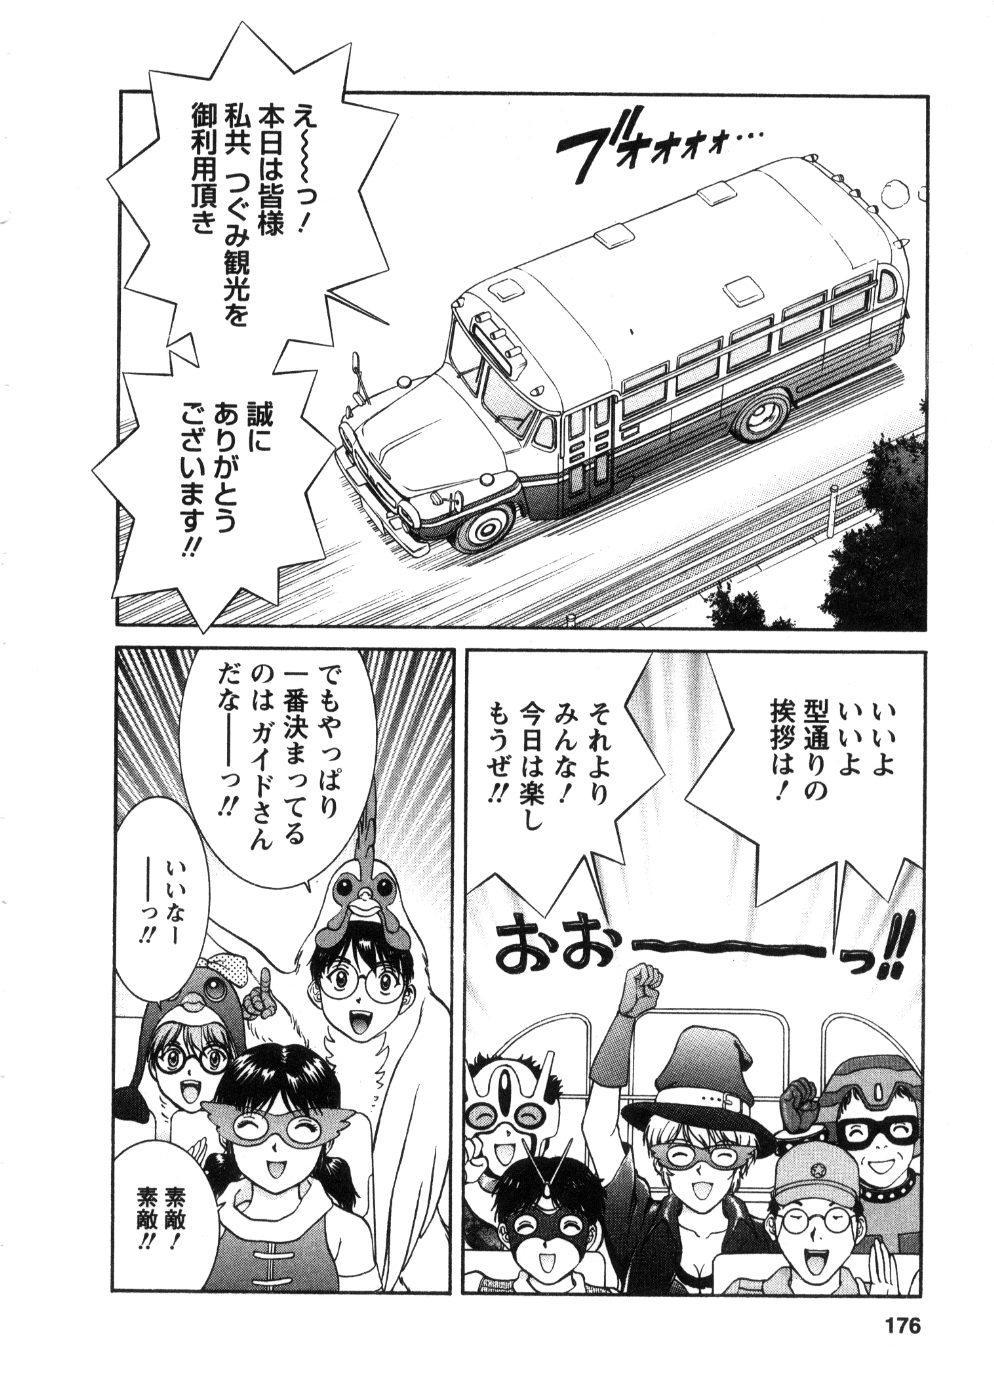 Oneechan-tachi ga Yatte Kuru 03 177